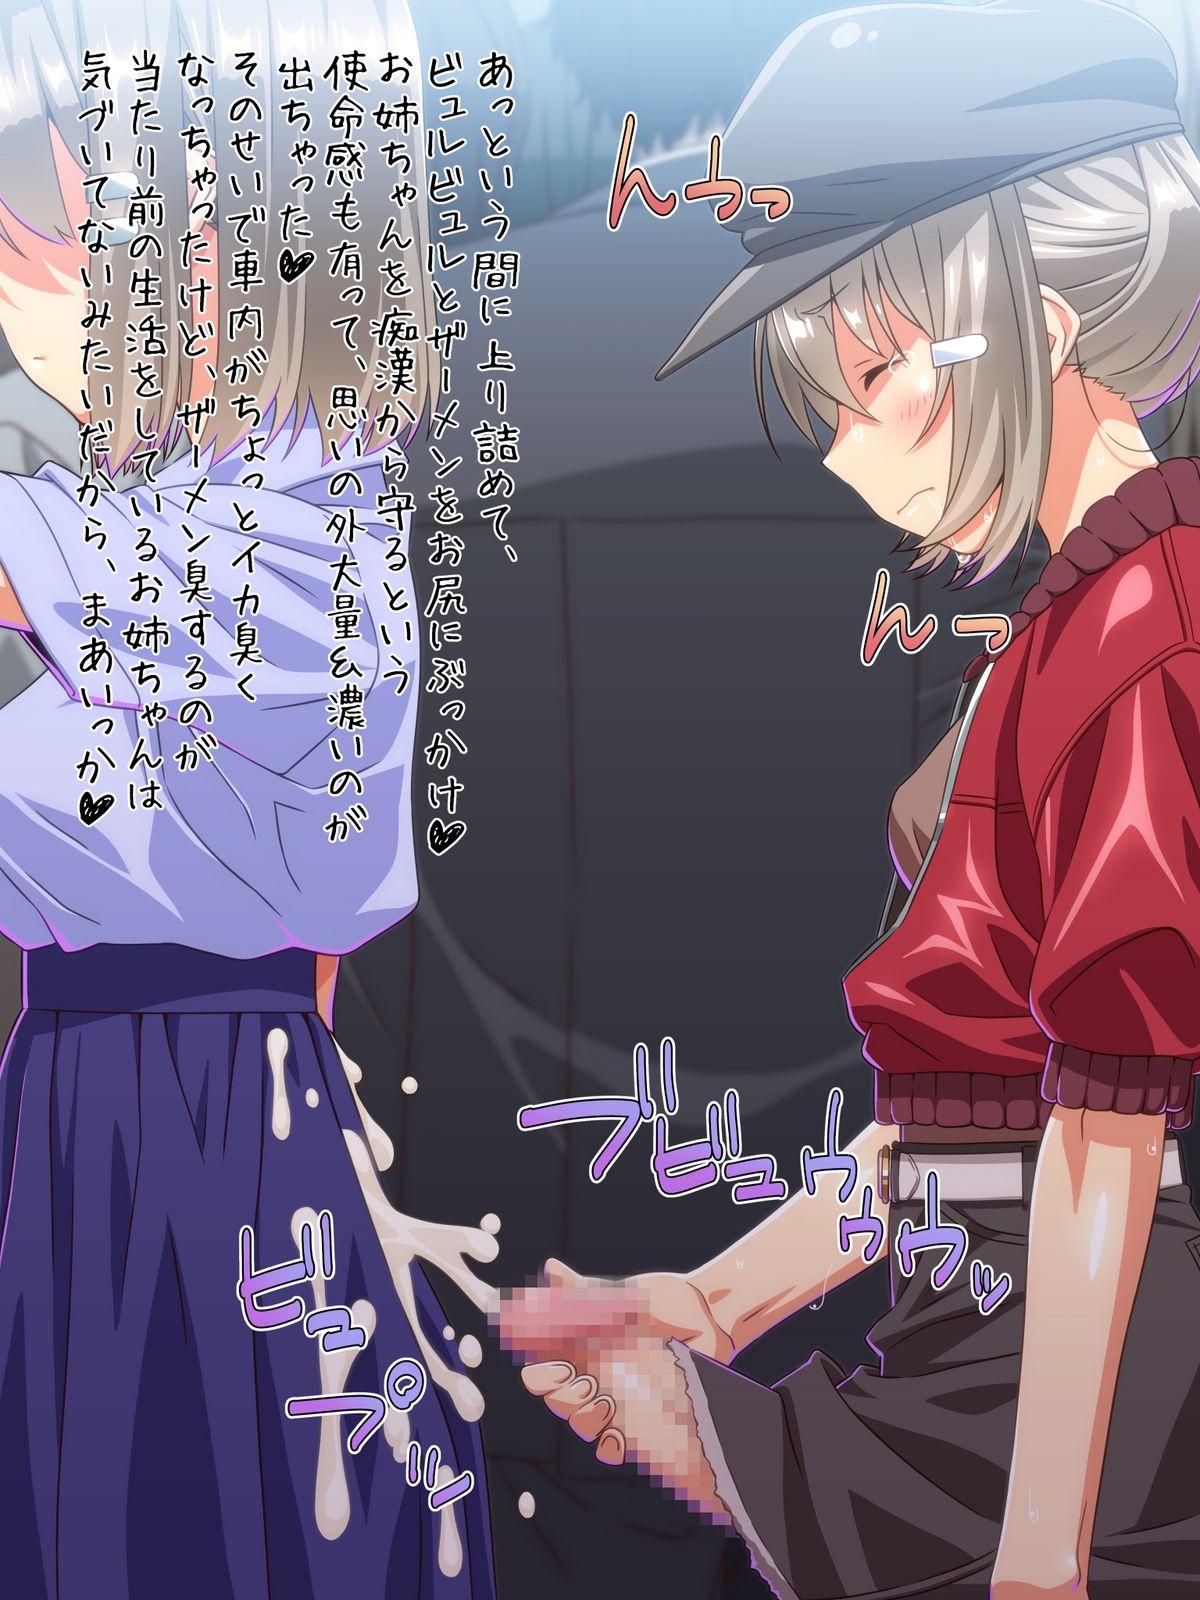 futanari 3 shoujo nikki no shasei Brother and sister